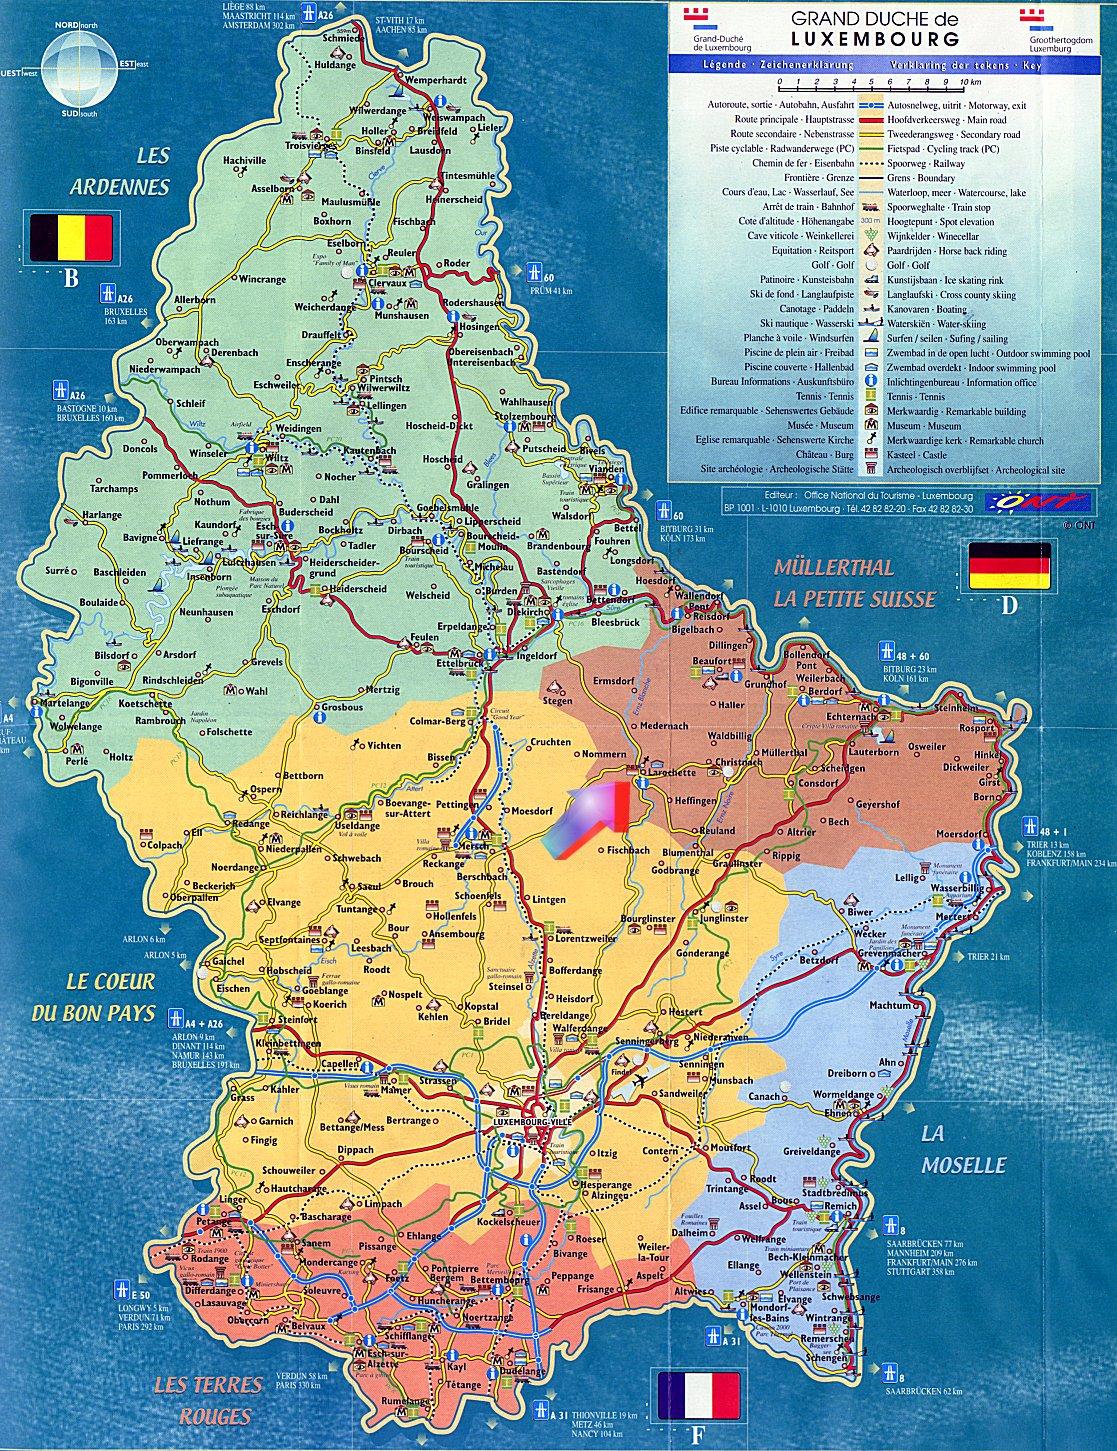 Mapas do Luxemburgo 30